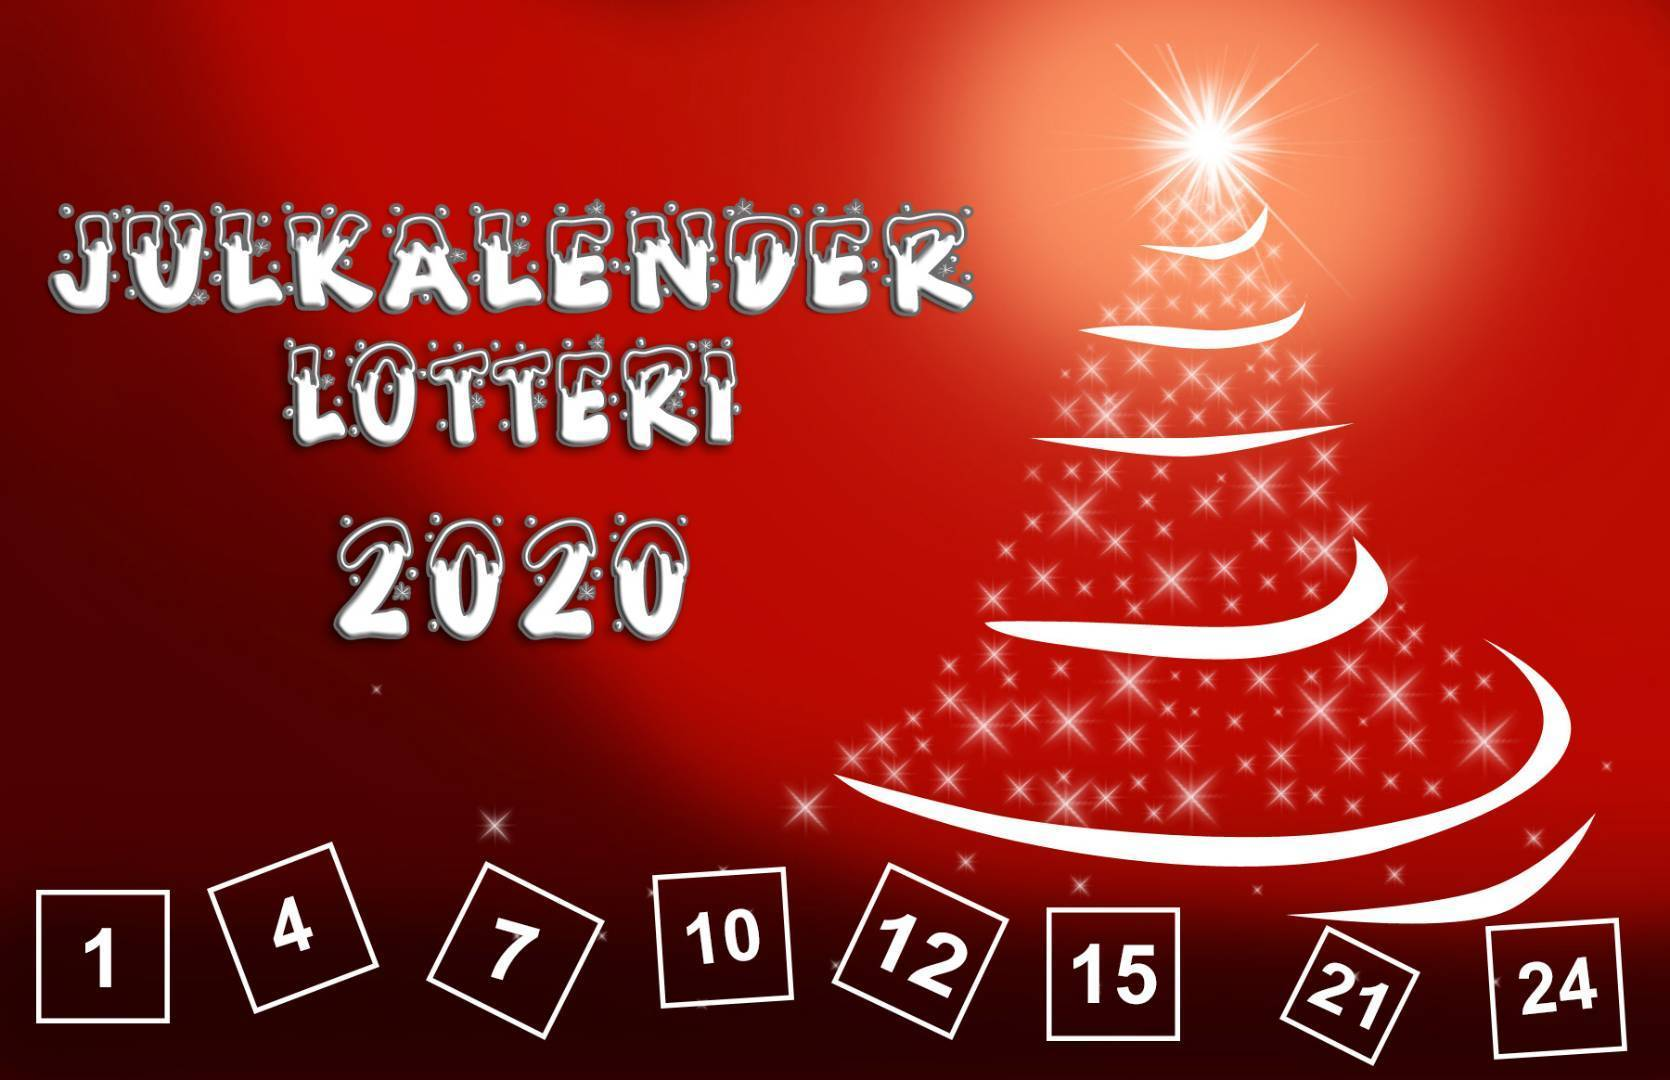 Julkalenderlotteri 2020